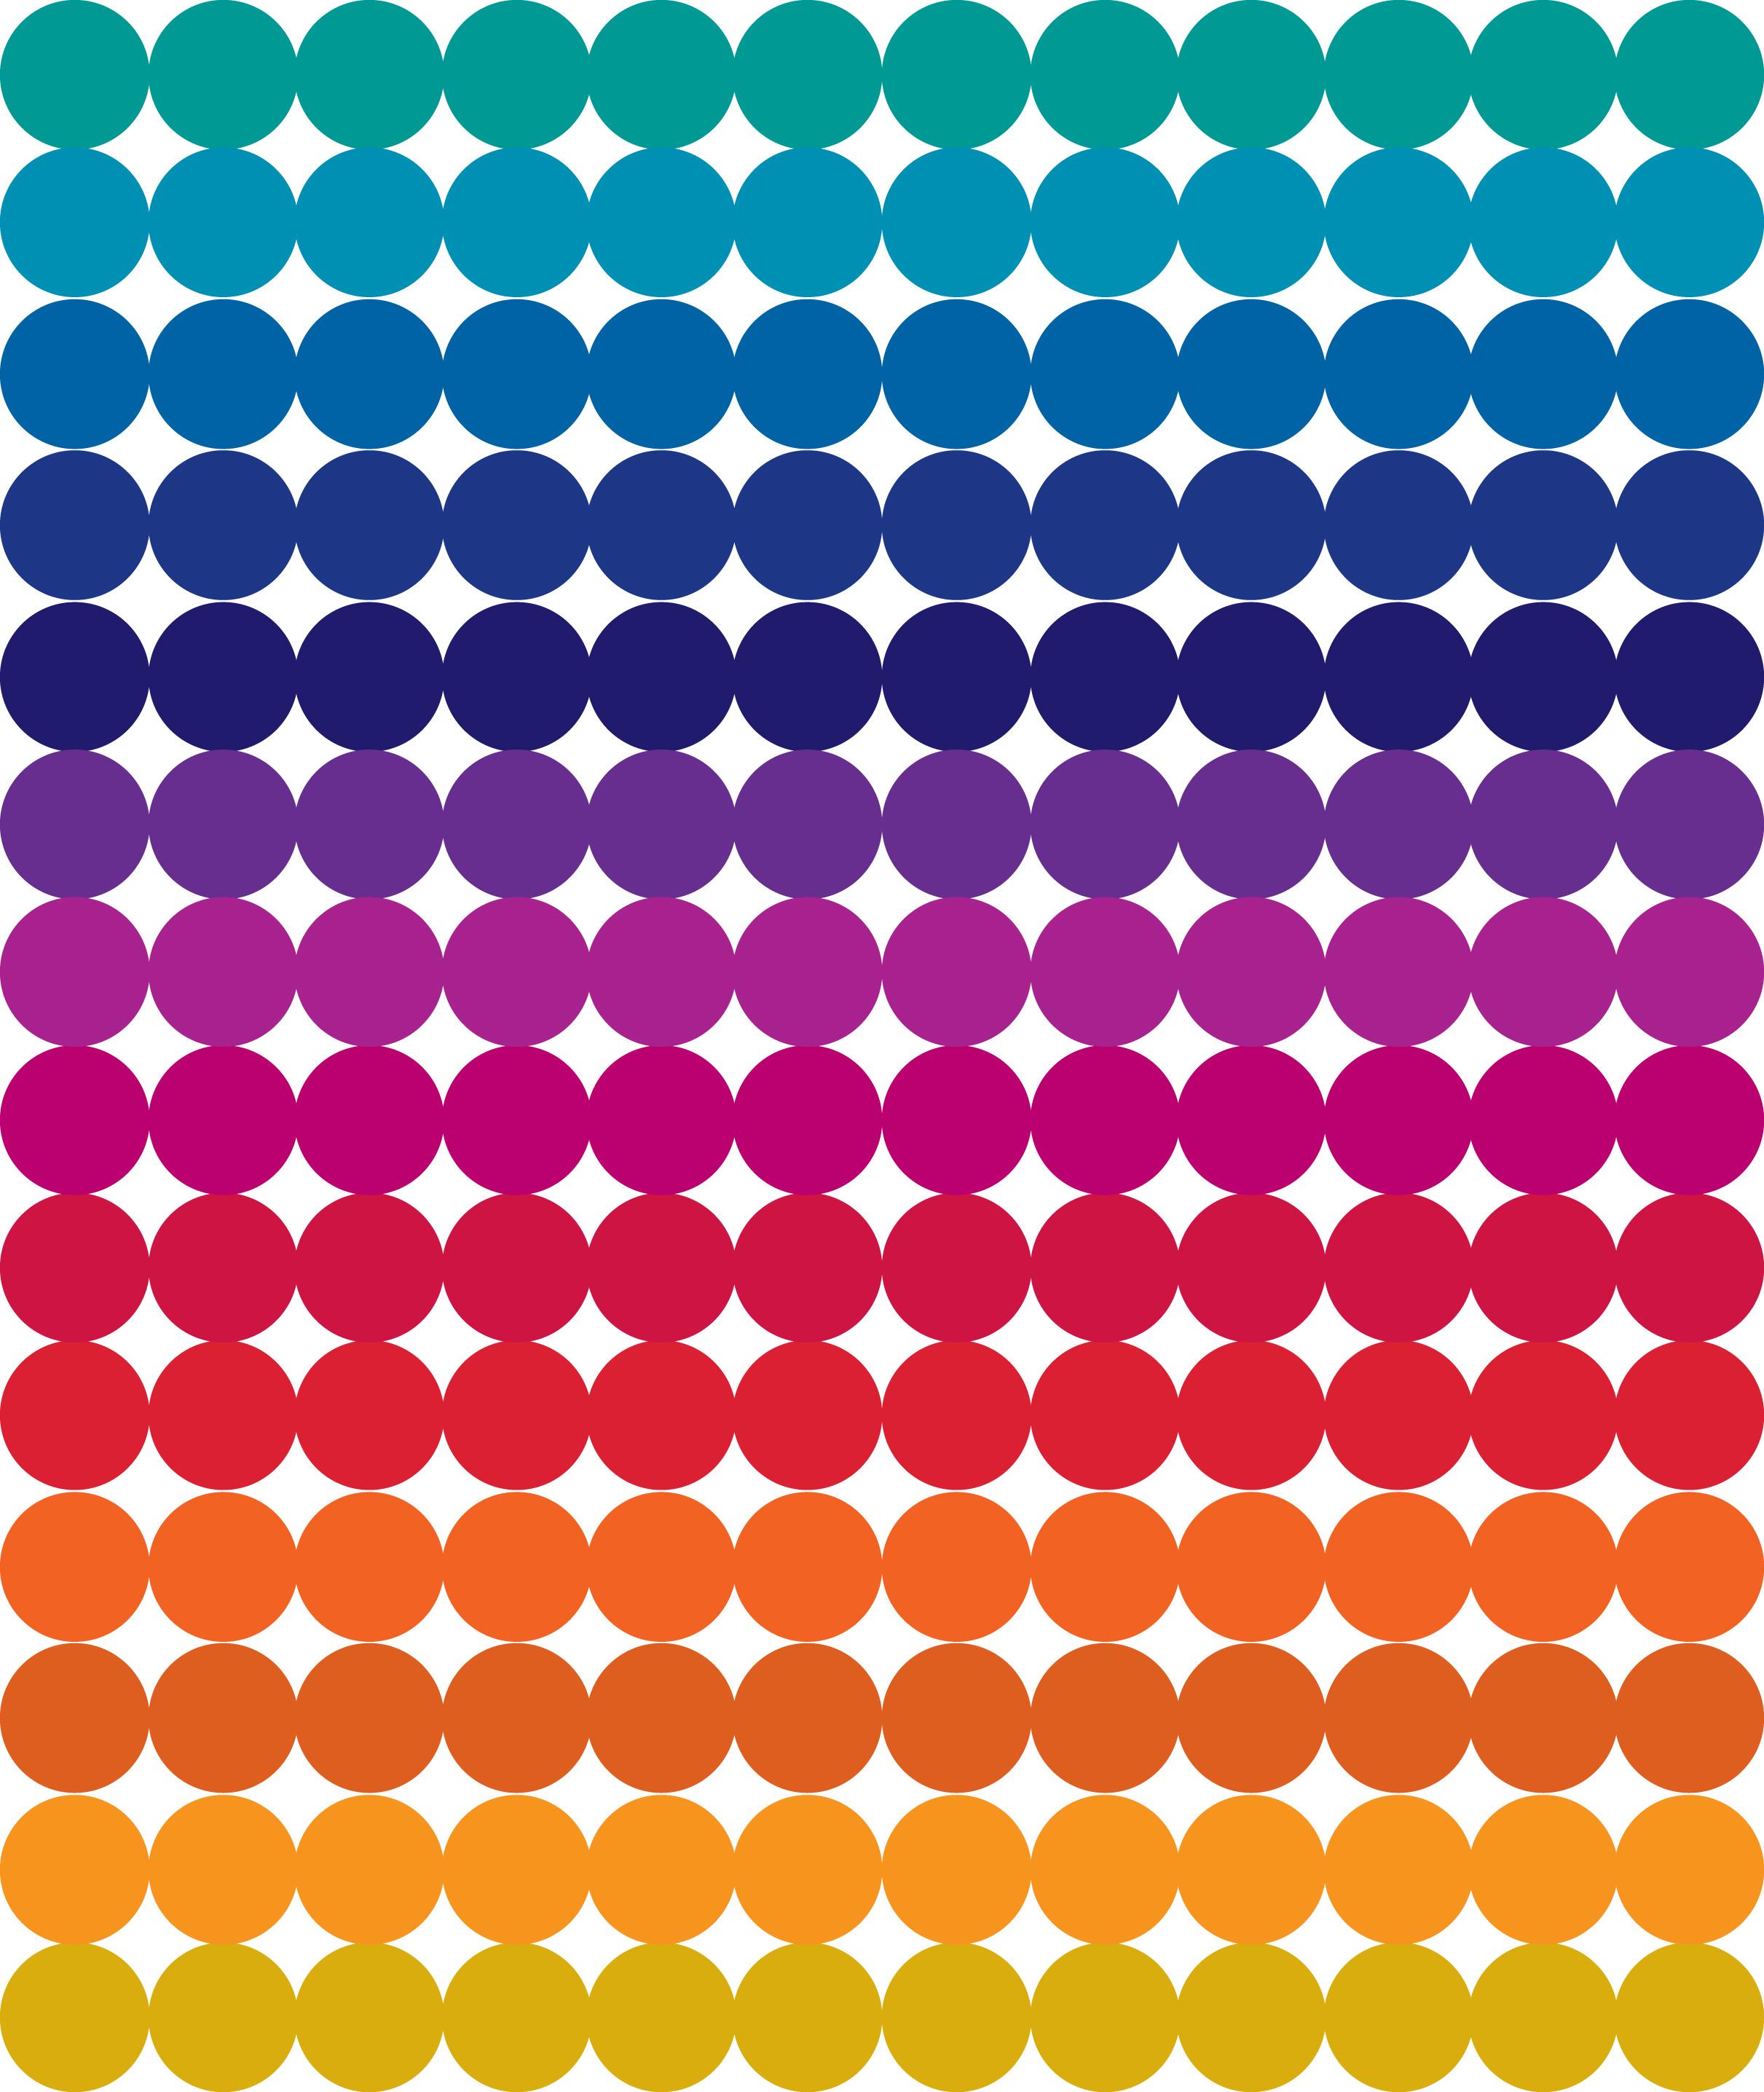 Graphic Design Color Patterns